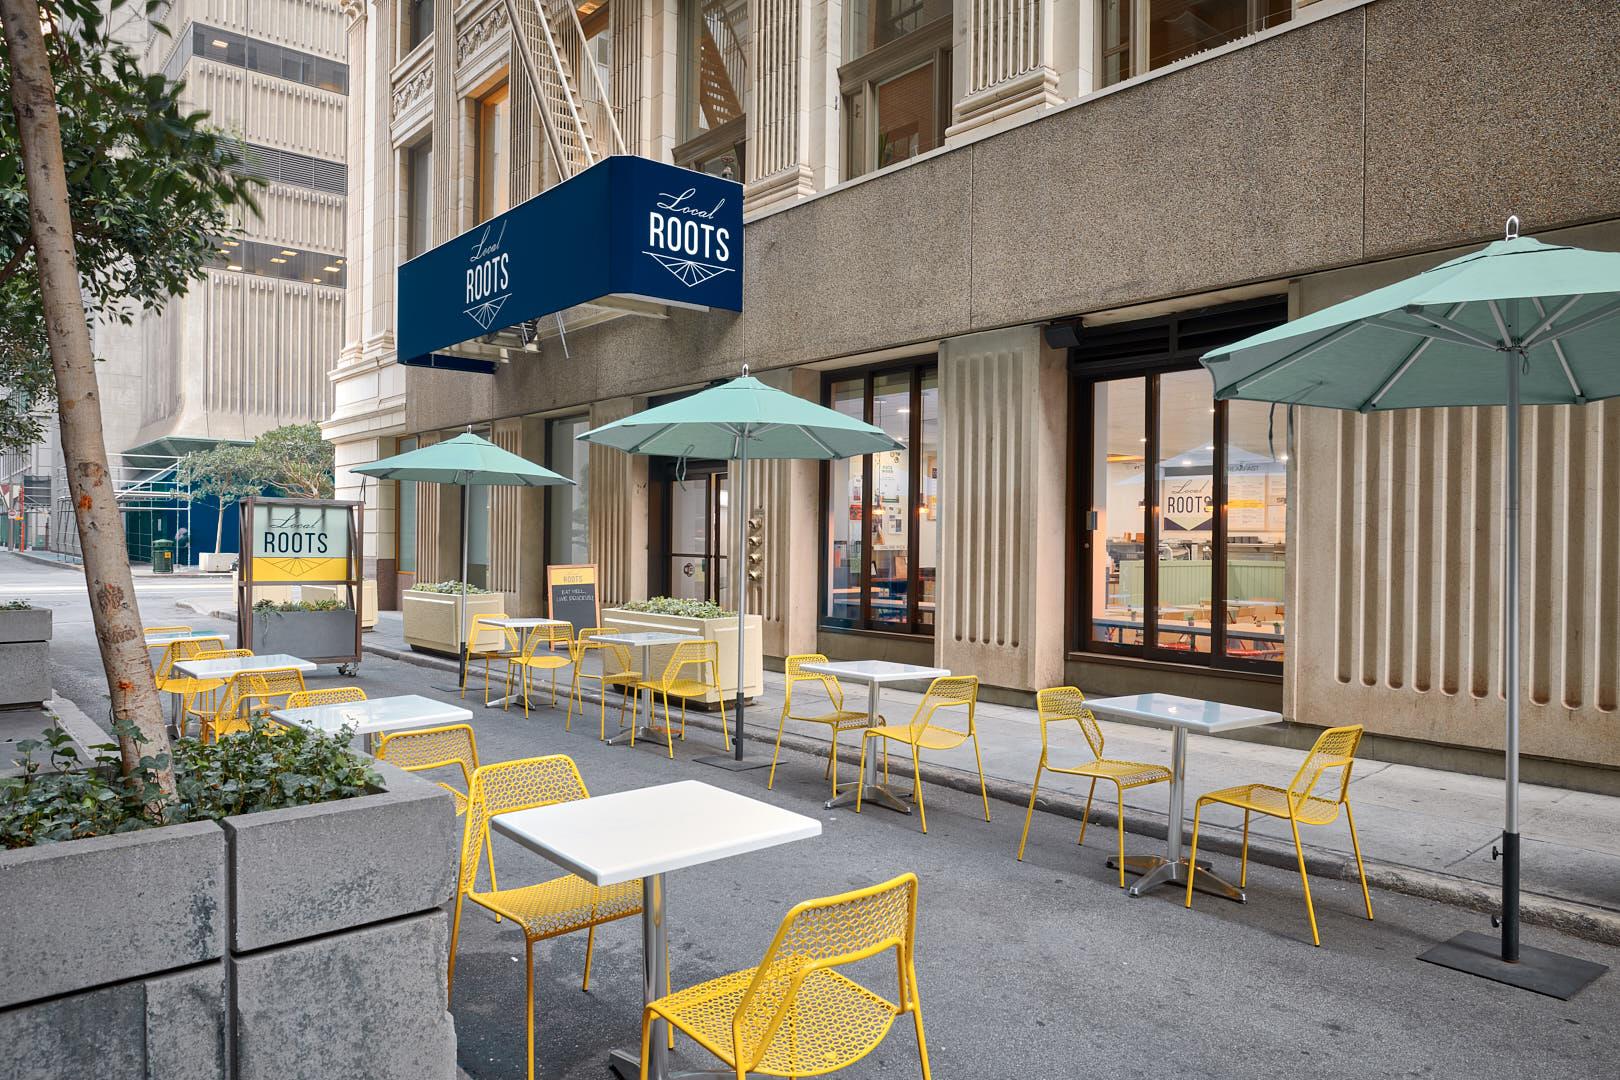 Photograph-of-Restaurant-Patio-Seating.jpg